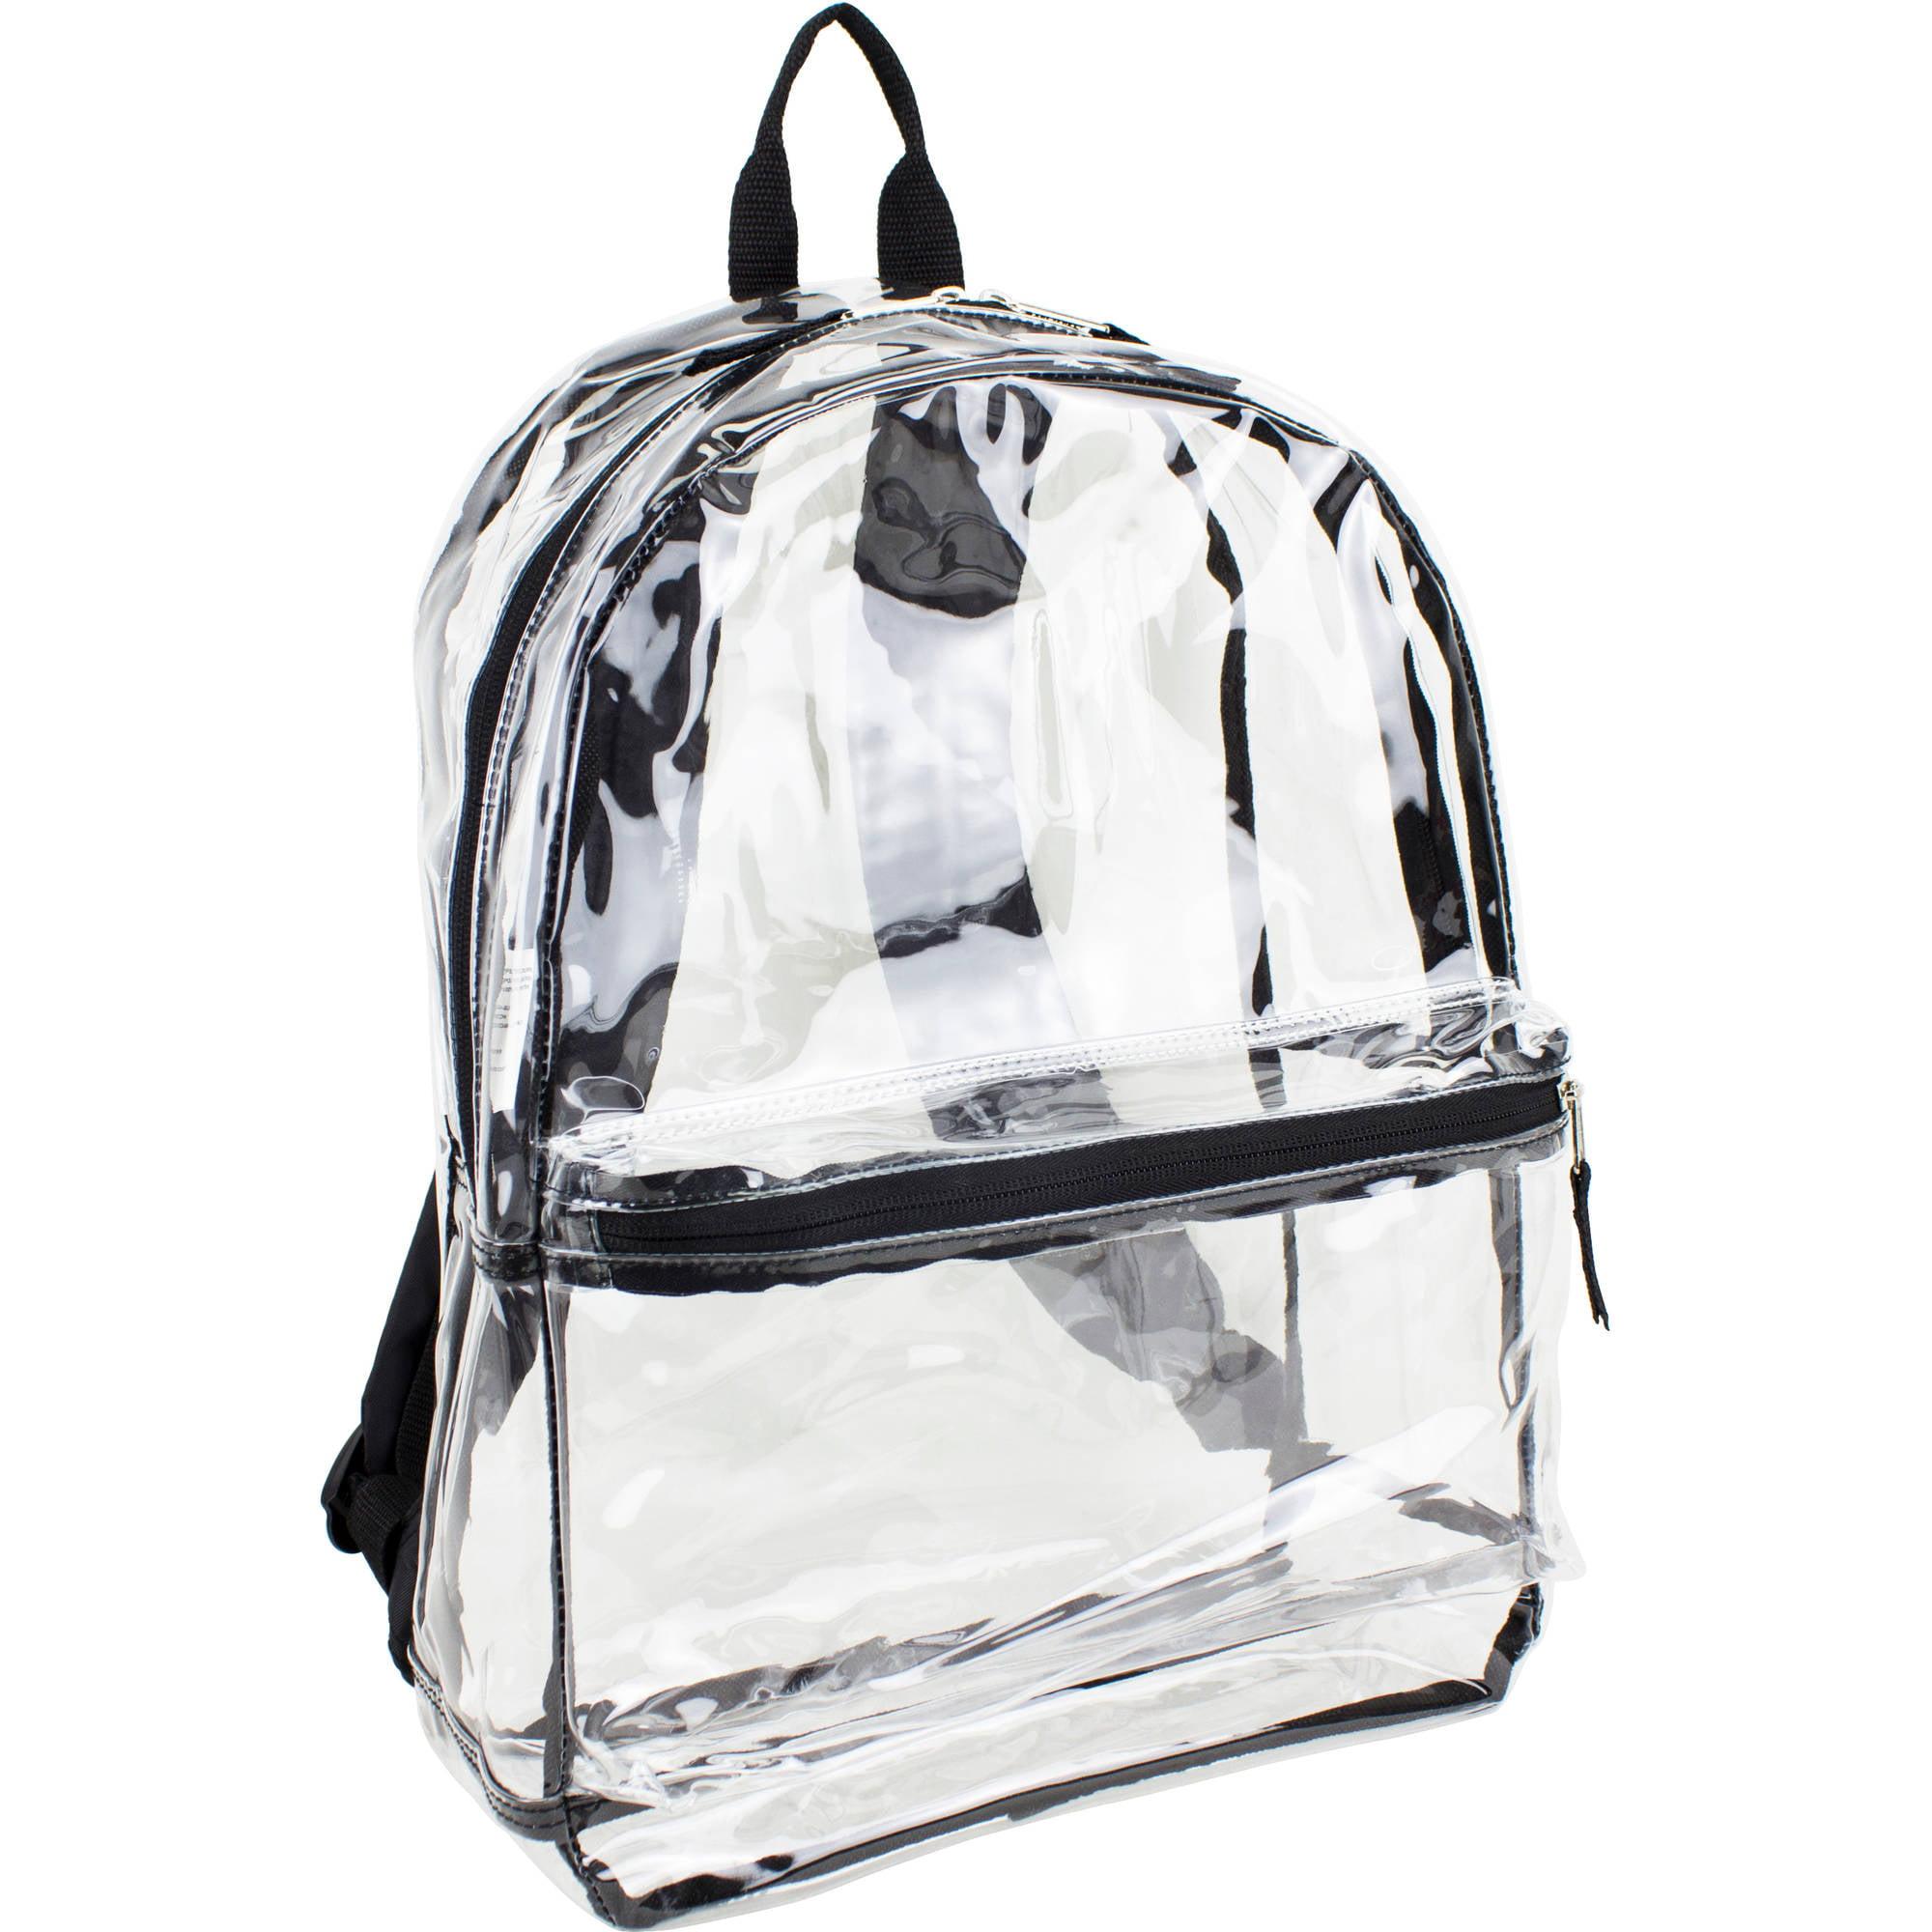 Eastsport Clear Backpack with Front Pocket and Adjustable Straps